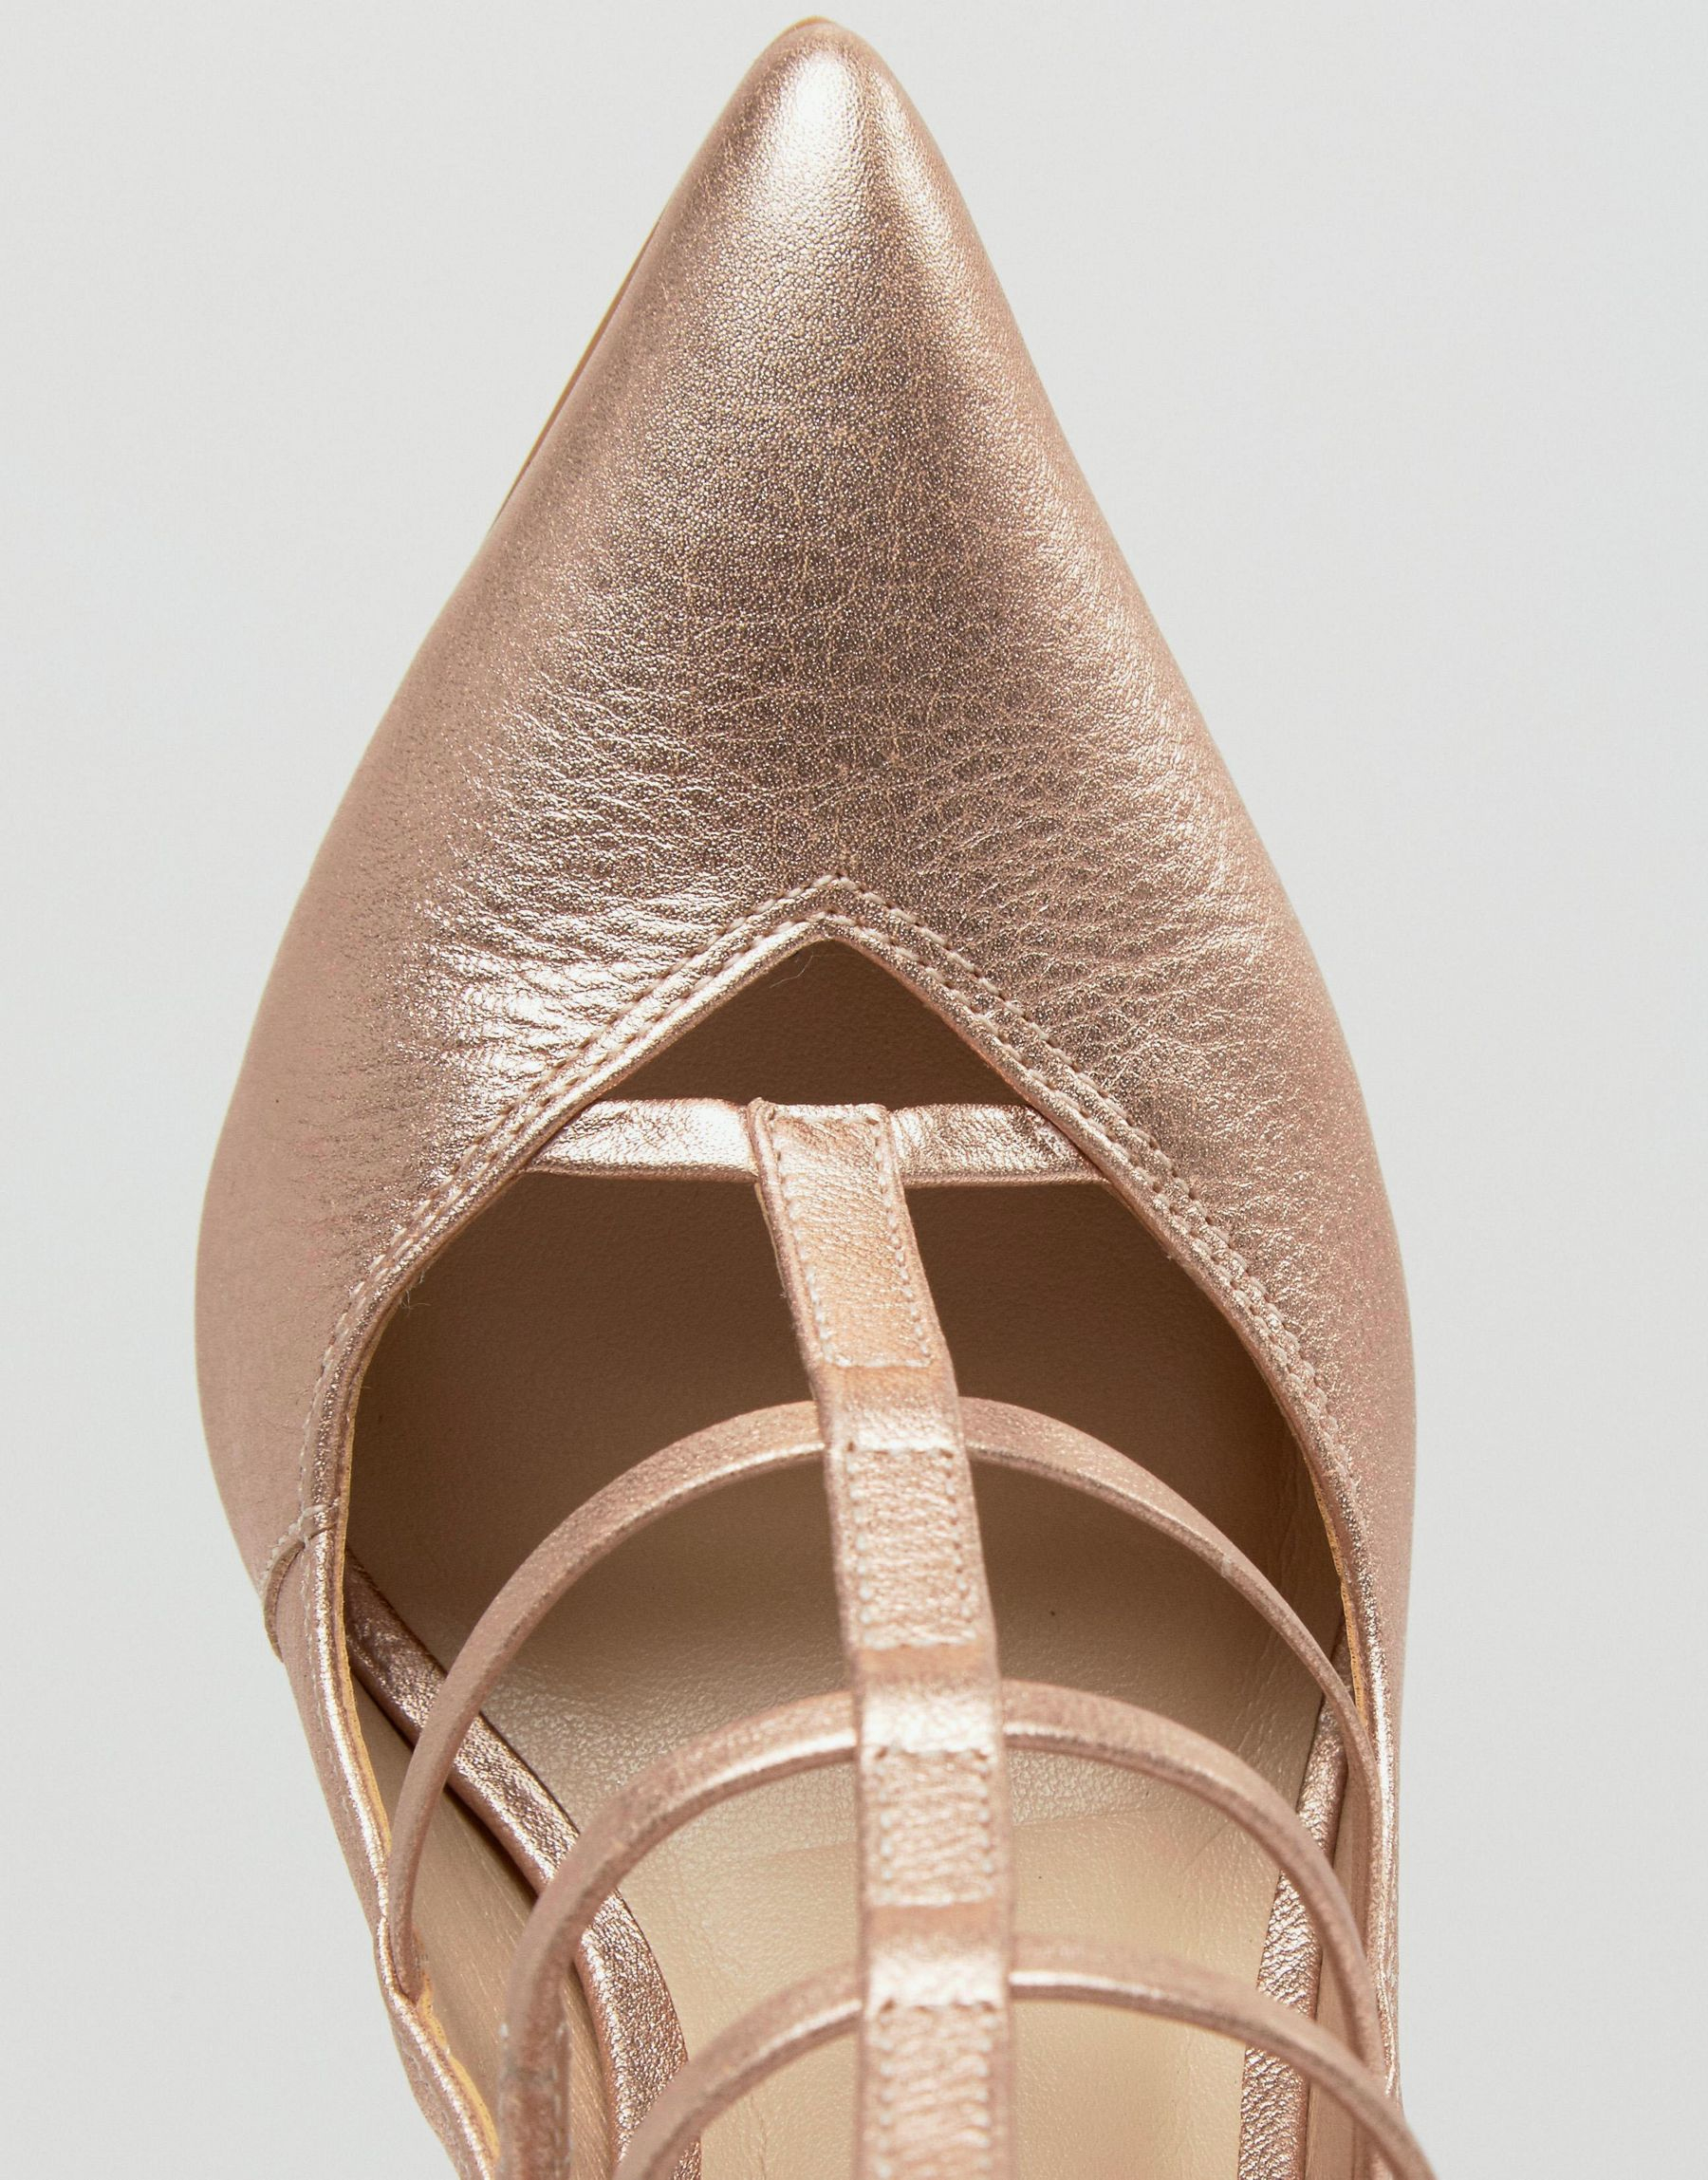 6a989181fd2 Lyst - Steve Madden Teve Madden Prazed Caged Court Shoes in Natural